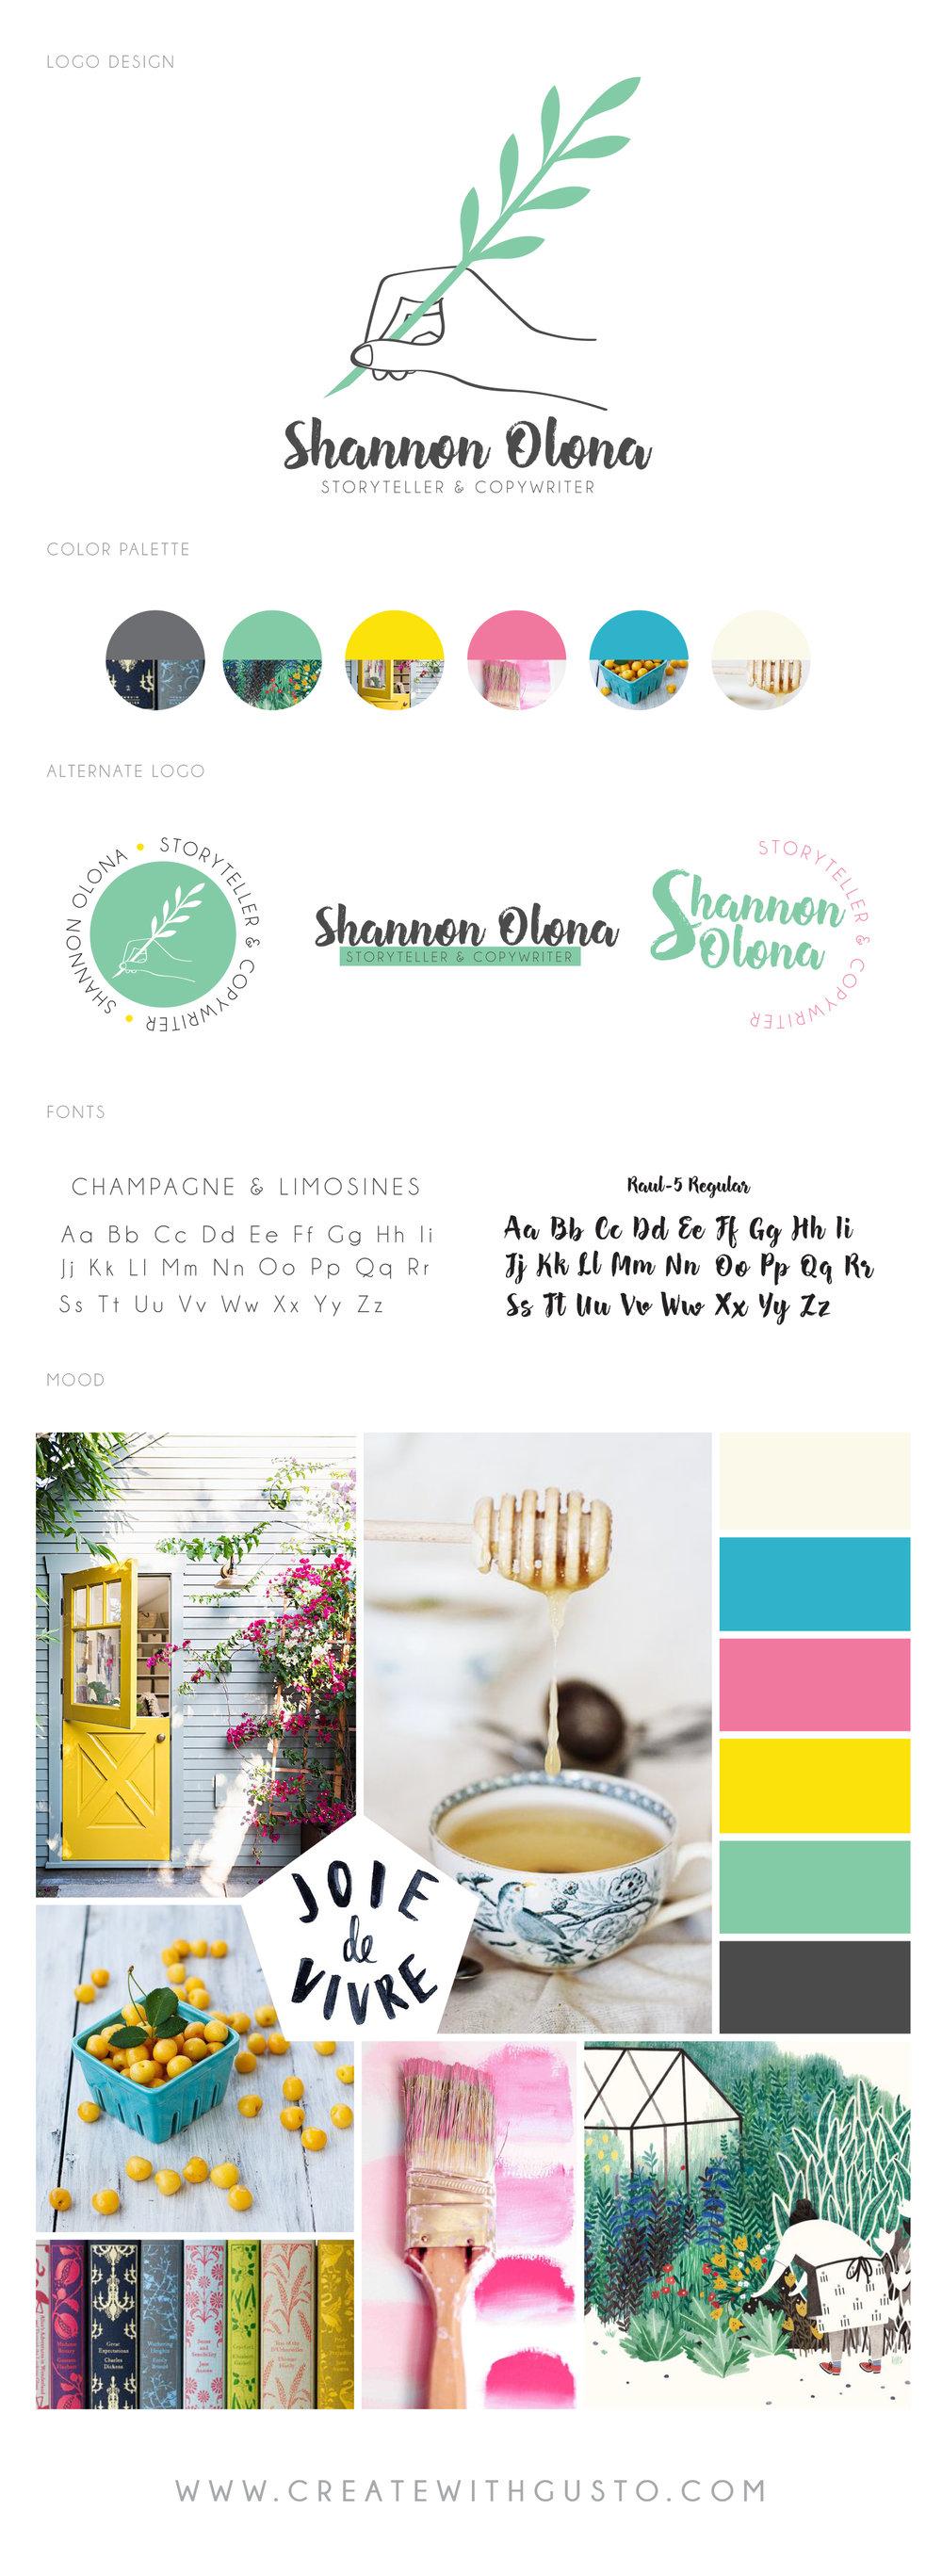 Shannon-Olona-copywriter-style-guide.jpg